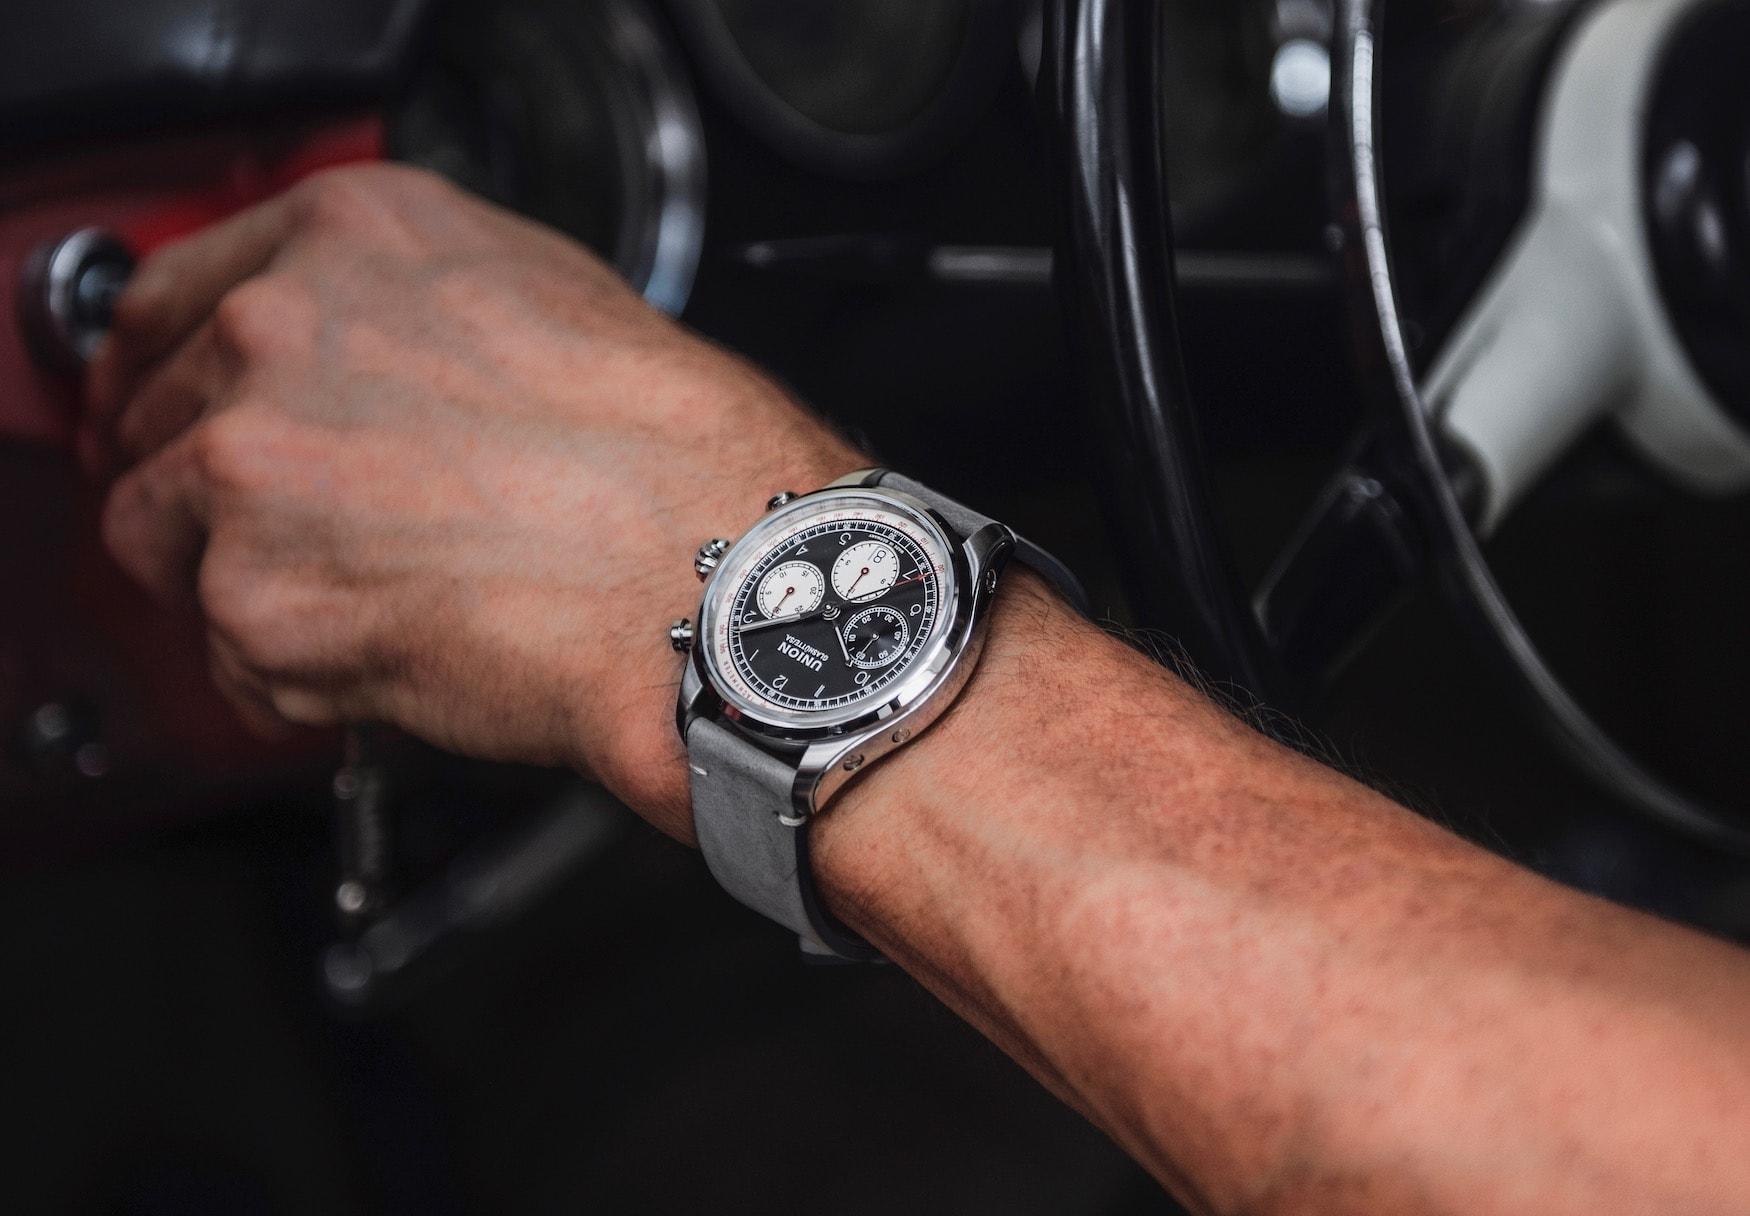 Mann trägt Uhrenmodell Belisar Chronograph